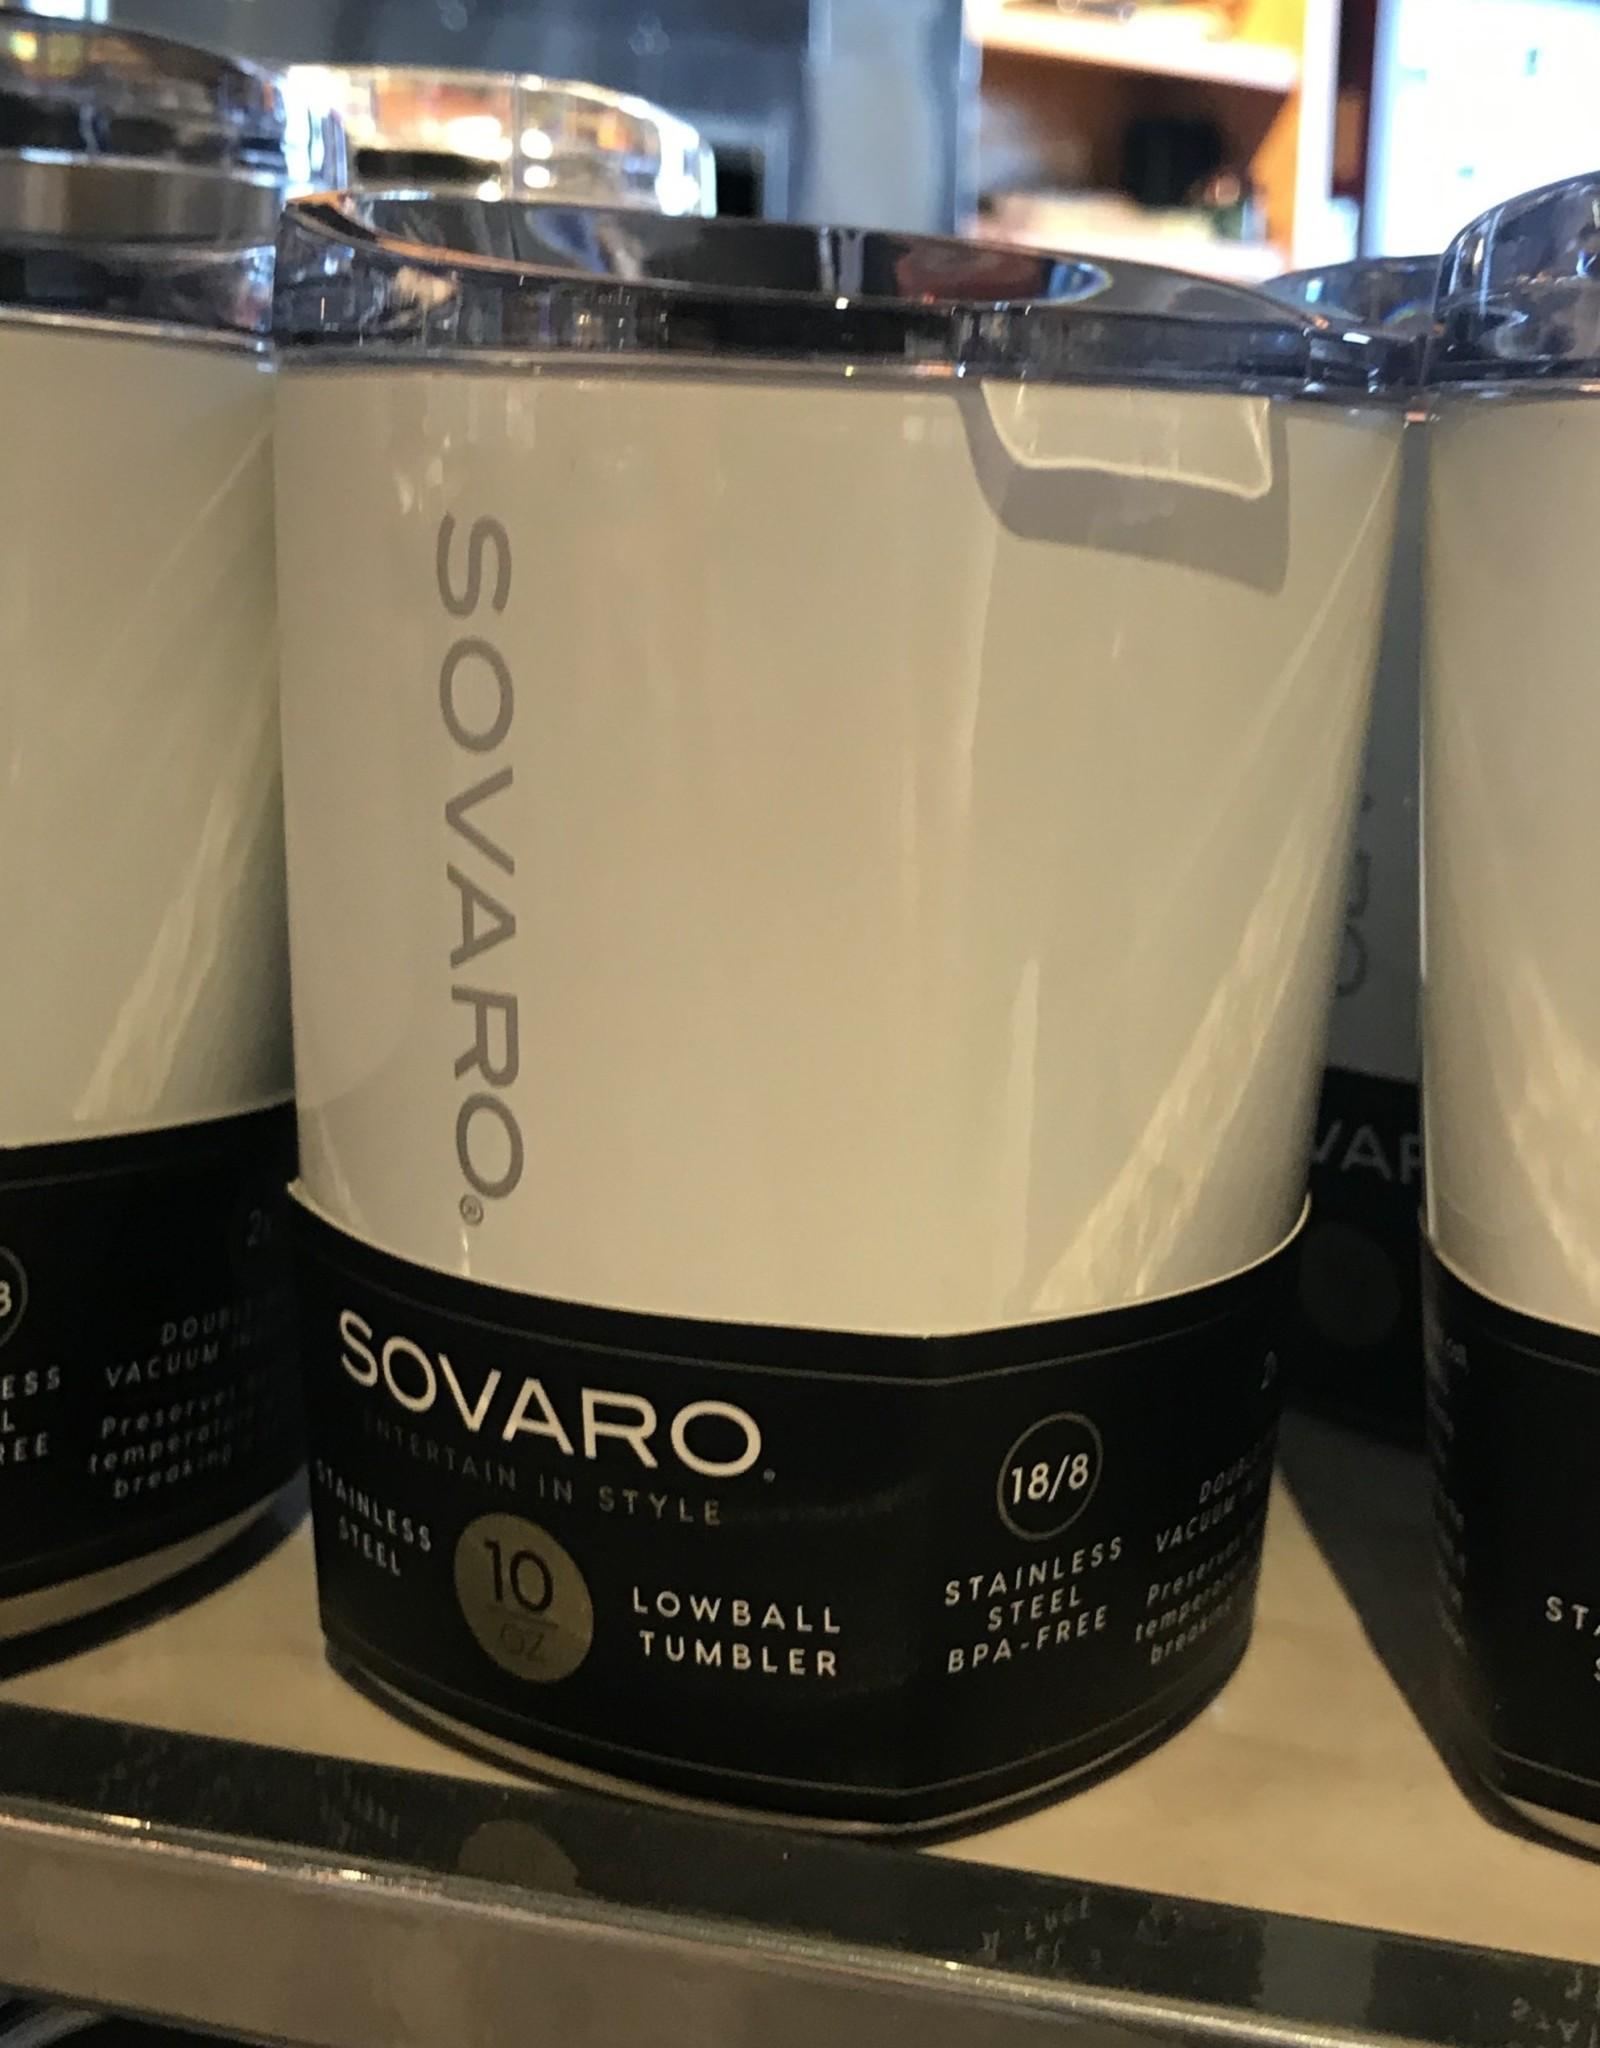 Sovaro Sovaro - Lowball Tumbler White